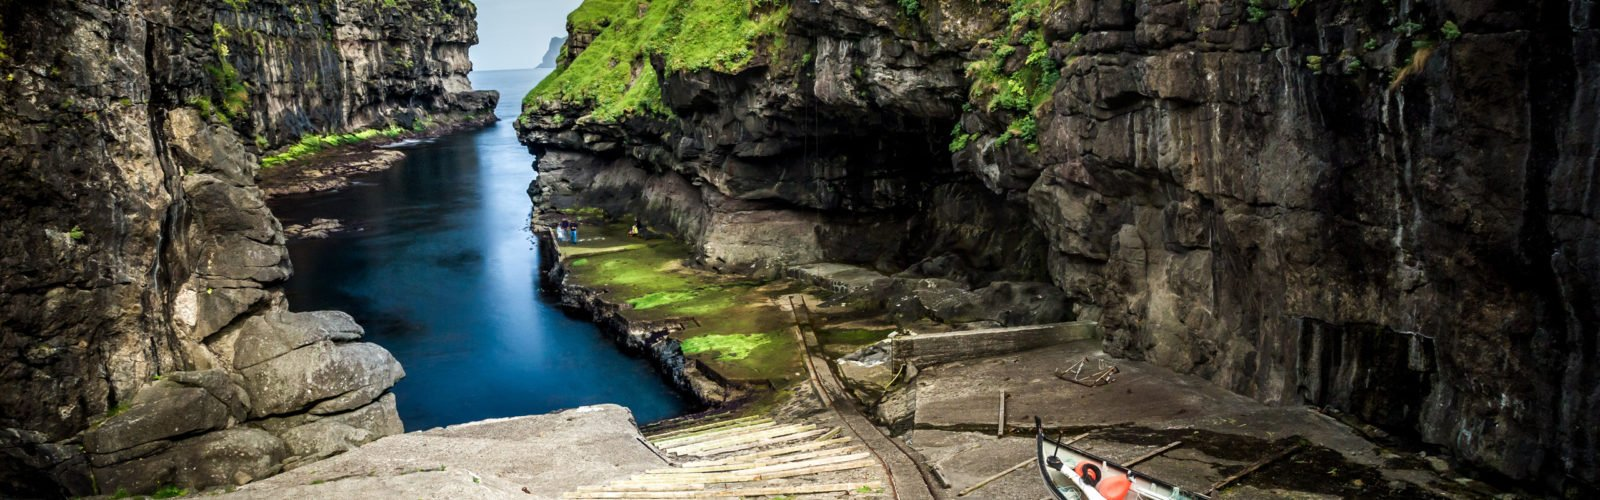 gjogv-boat-faroe-islands-denmark